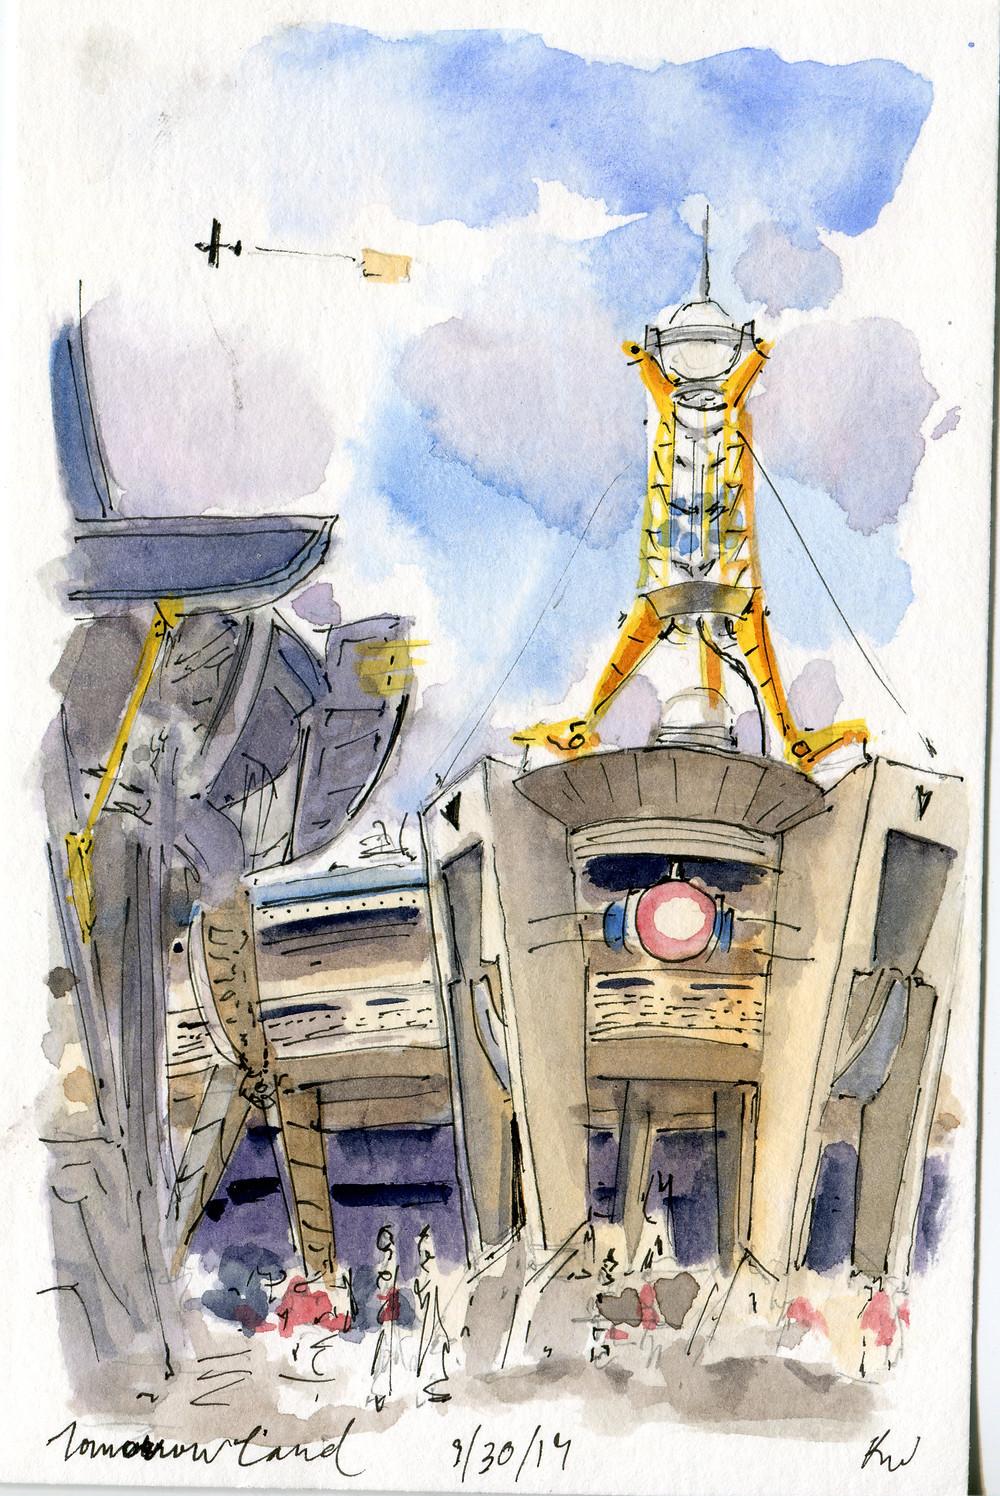 Watercolor Sketch, Tomorrowland Disney World, Magic Kingdom